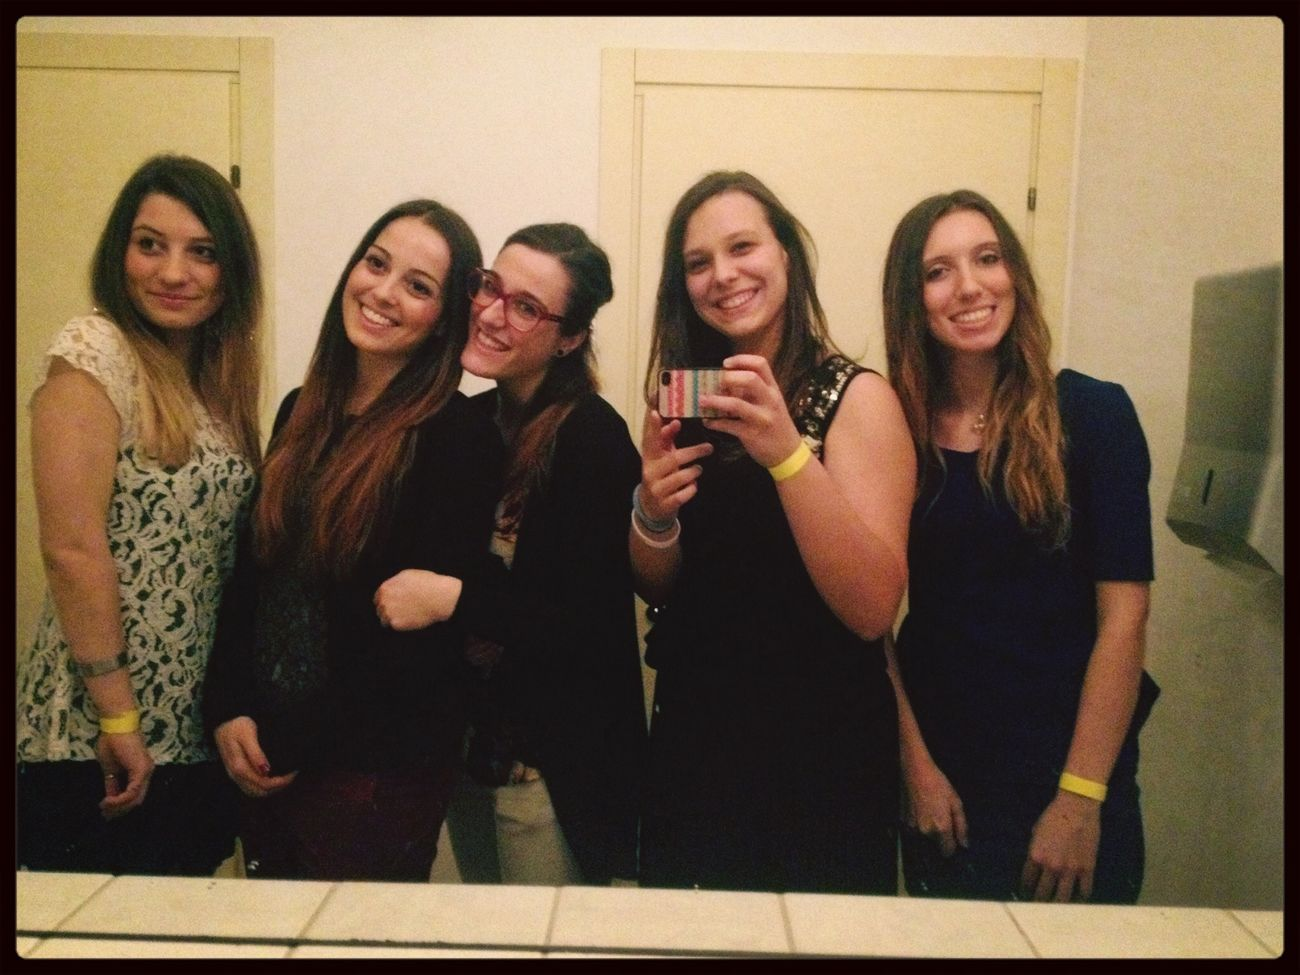 ❤️❤️ Party +18 Bigbolgia First Eyeem Photo